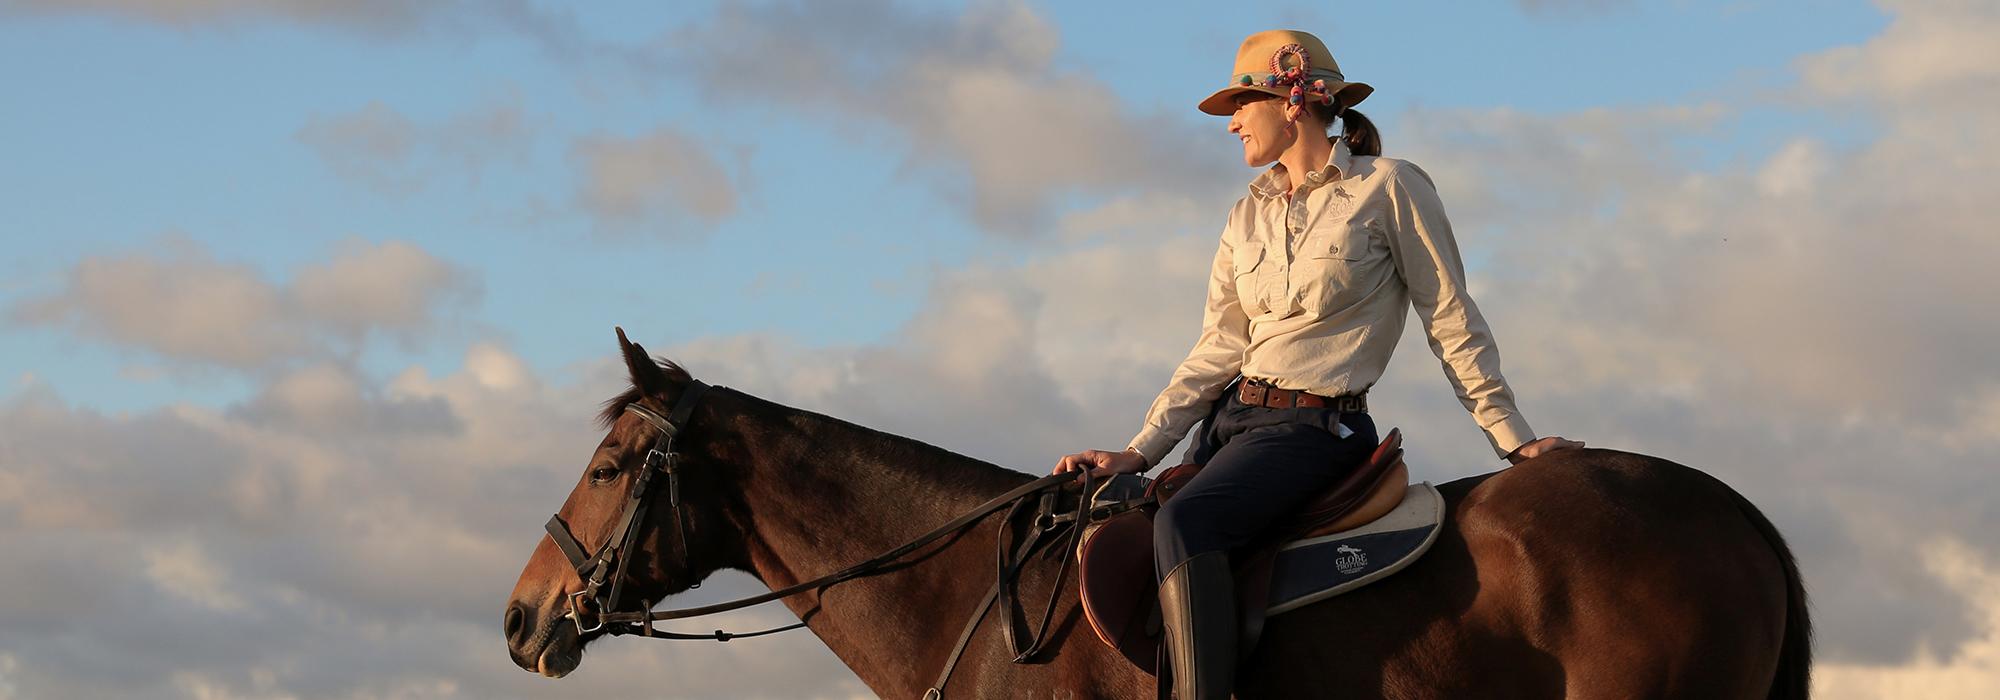 10 Gift Ideas for Horse Loving Travel Addicts - Globetrotting horse riding holidays